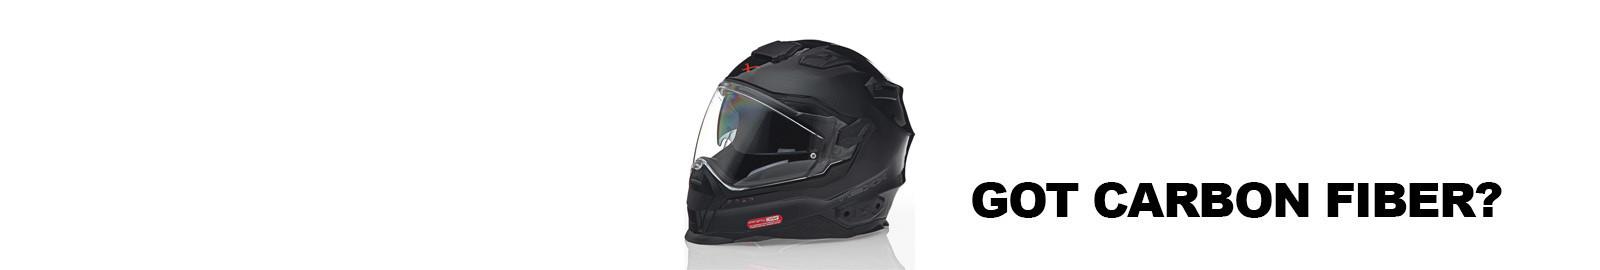 Nexx XWST 2 Helmets